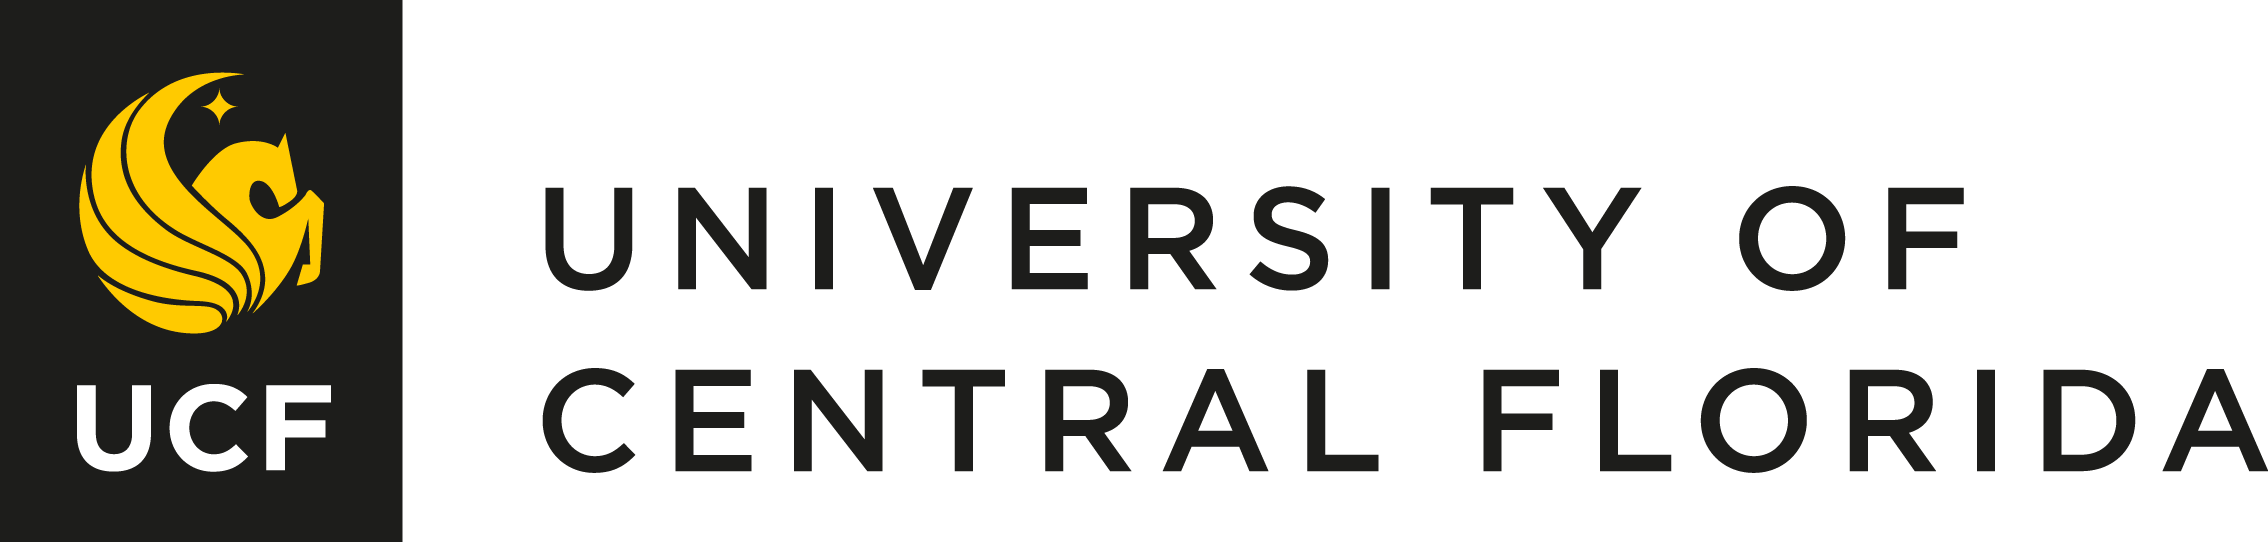 university-of-central_florida-logo